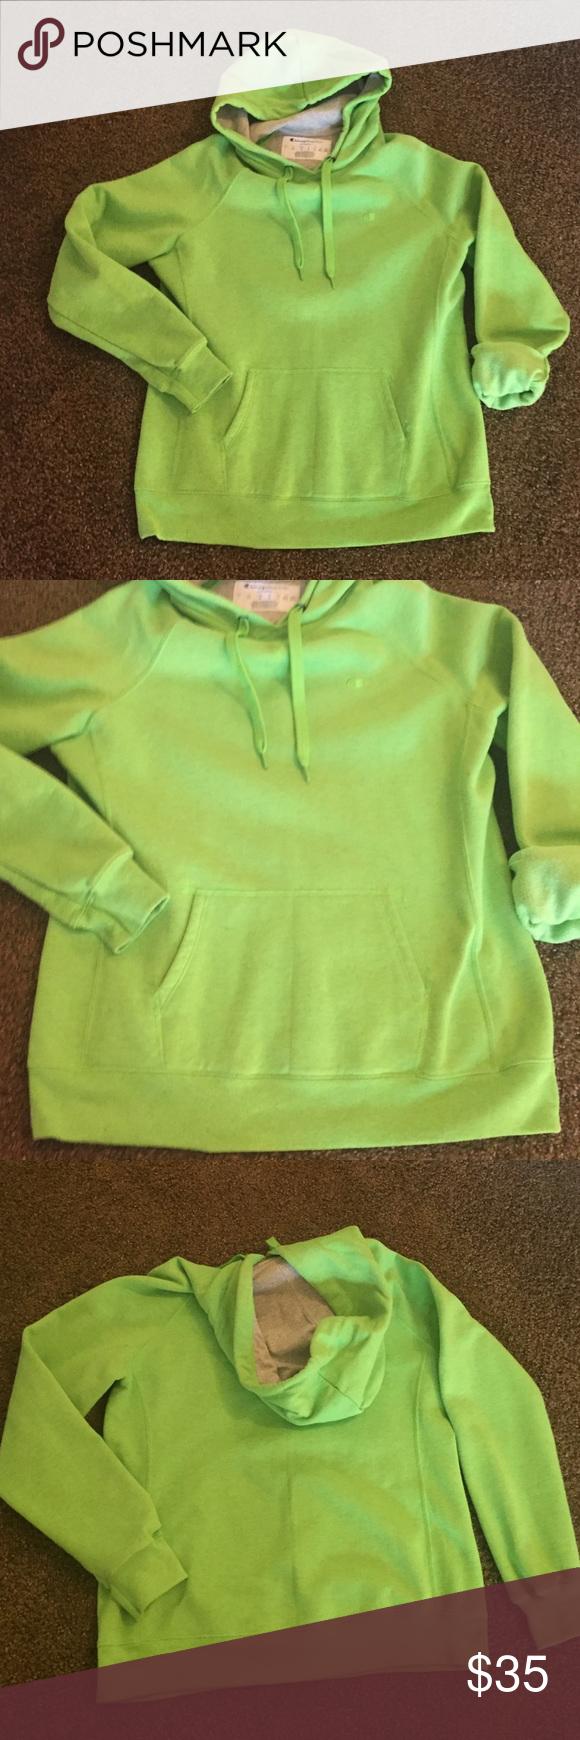 choose original yet not vulgar shop for genuine Champion hoodie 💚Lime green • size -L💚 Champion ECO hoodie ...